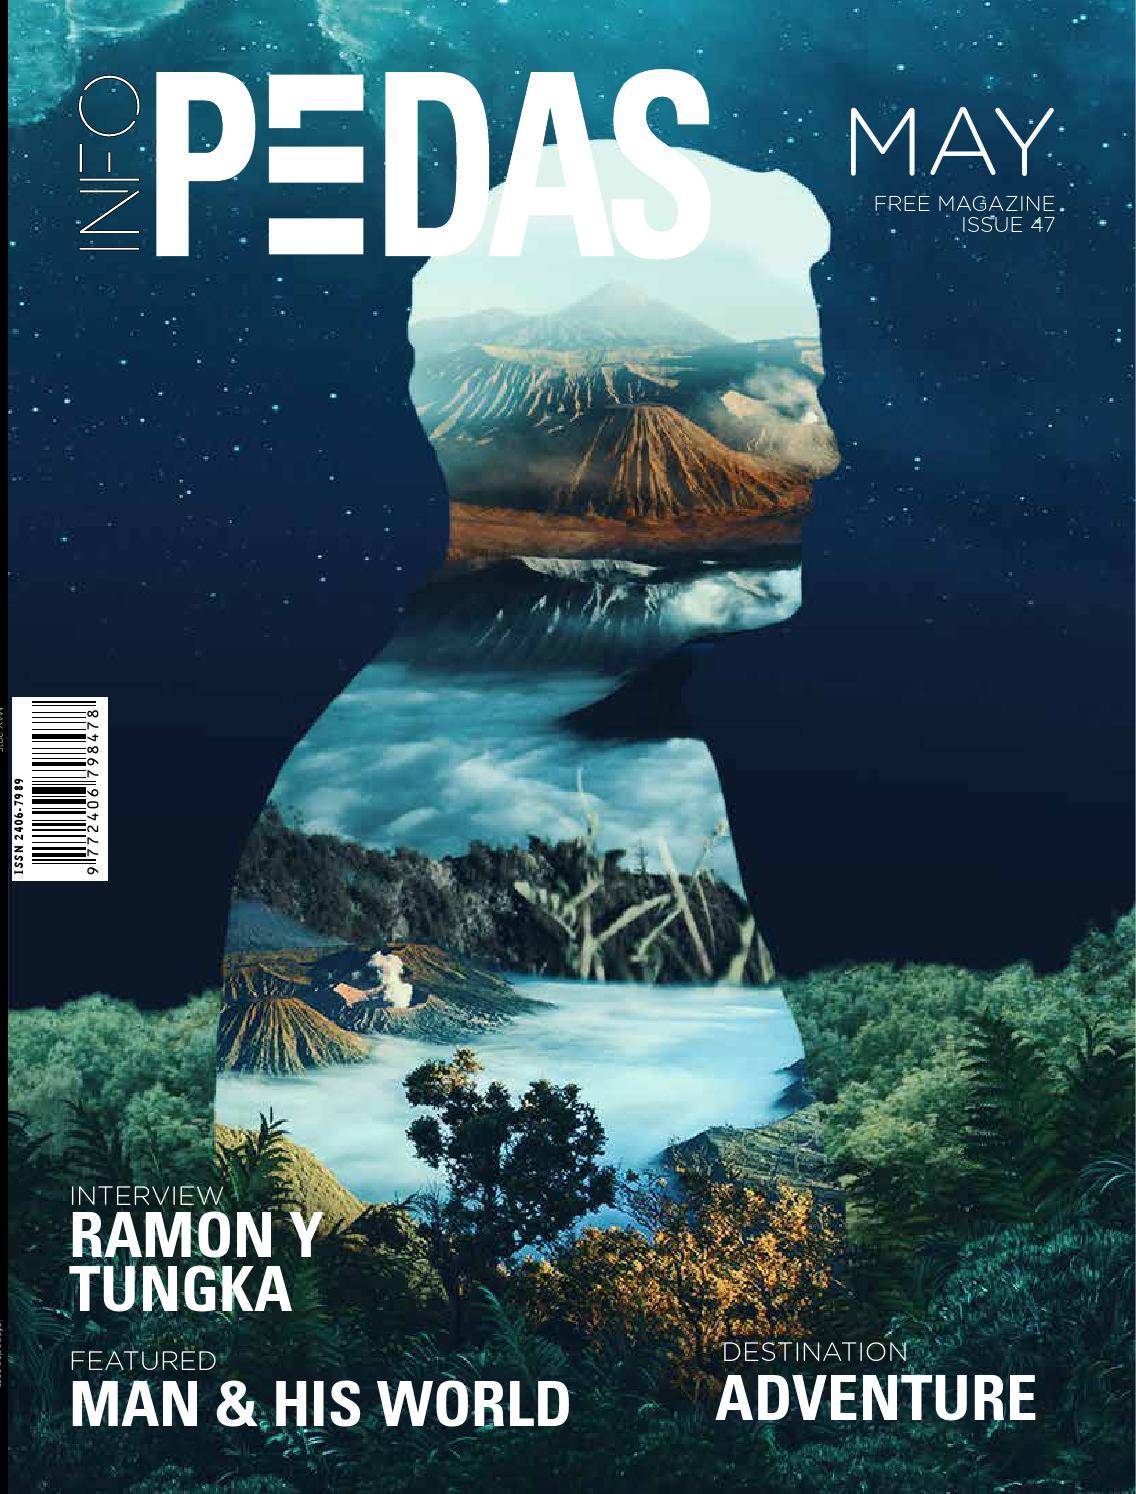 Majalah Infopedas Edisi 47 By Pedas Issuu Nature Pecinta Voucher Hypermart 50000 Alam